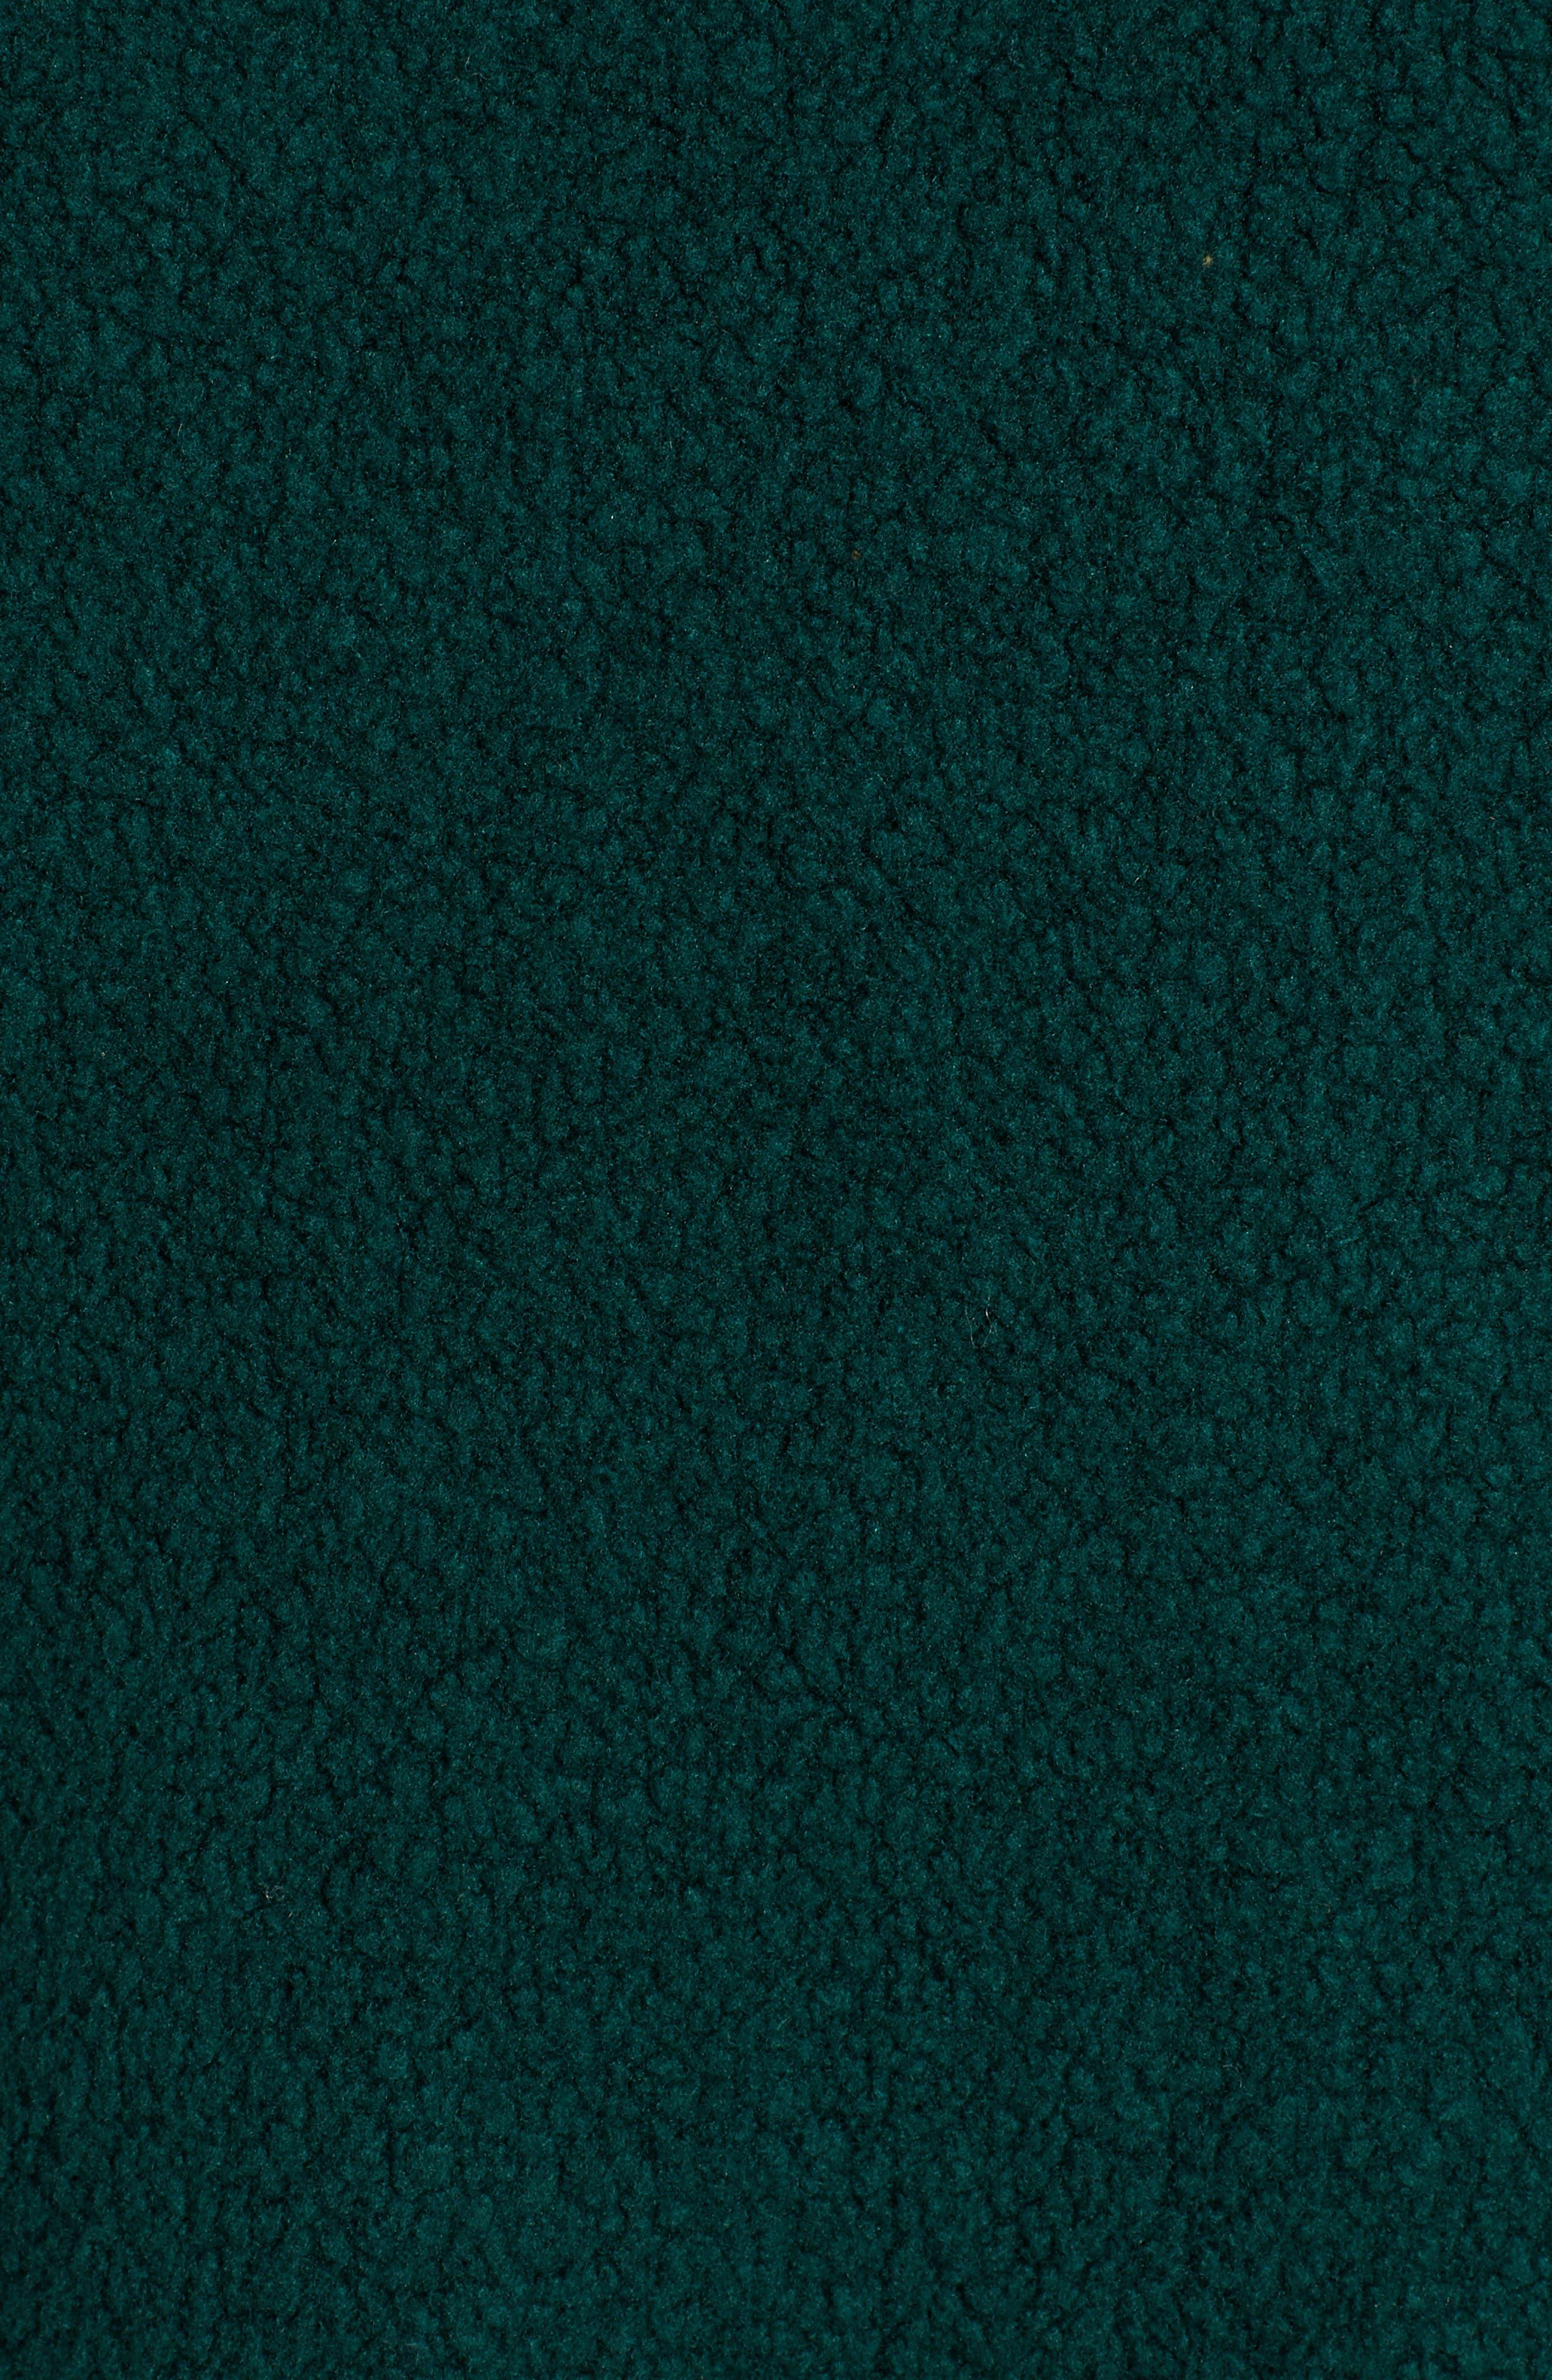 Velvet Stripe Crop Fleece Sweatshirt,                             Alternate thumbnail 5, color,                             BOTANICAL GREEN